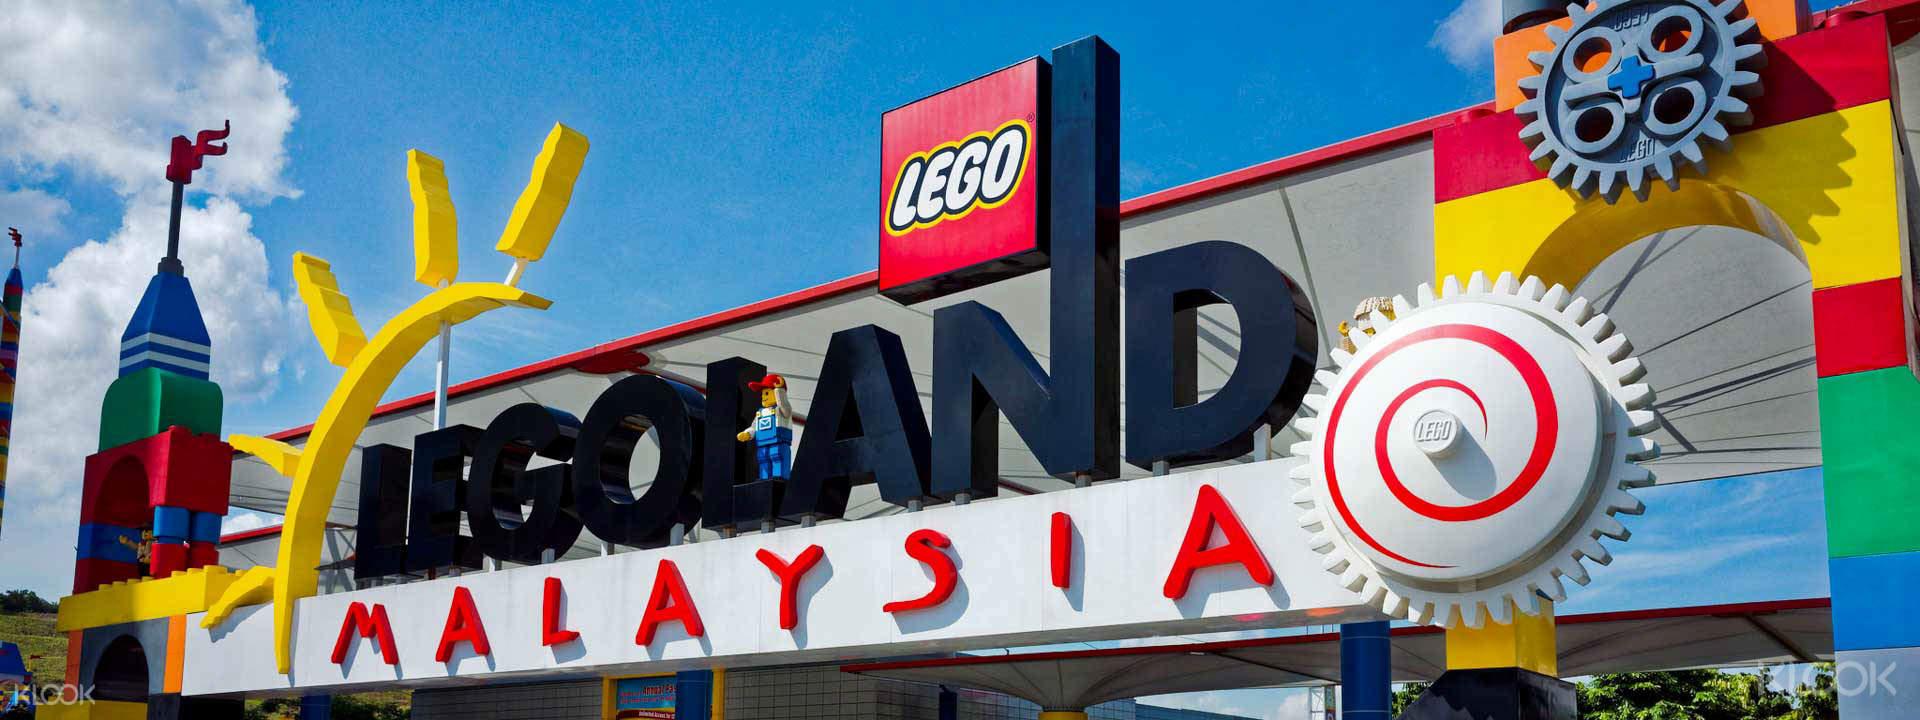 Legoland Ticket Johor Bahru, Malaysia - Klook